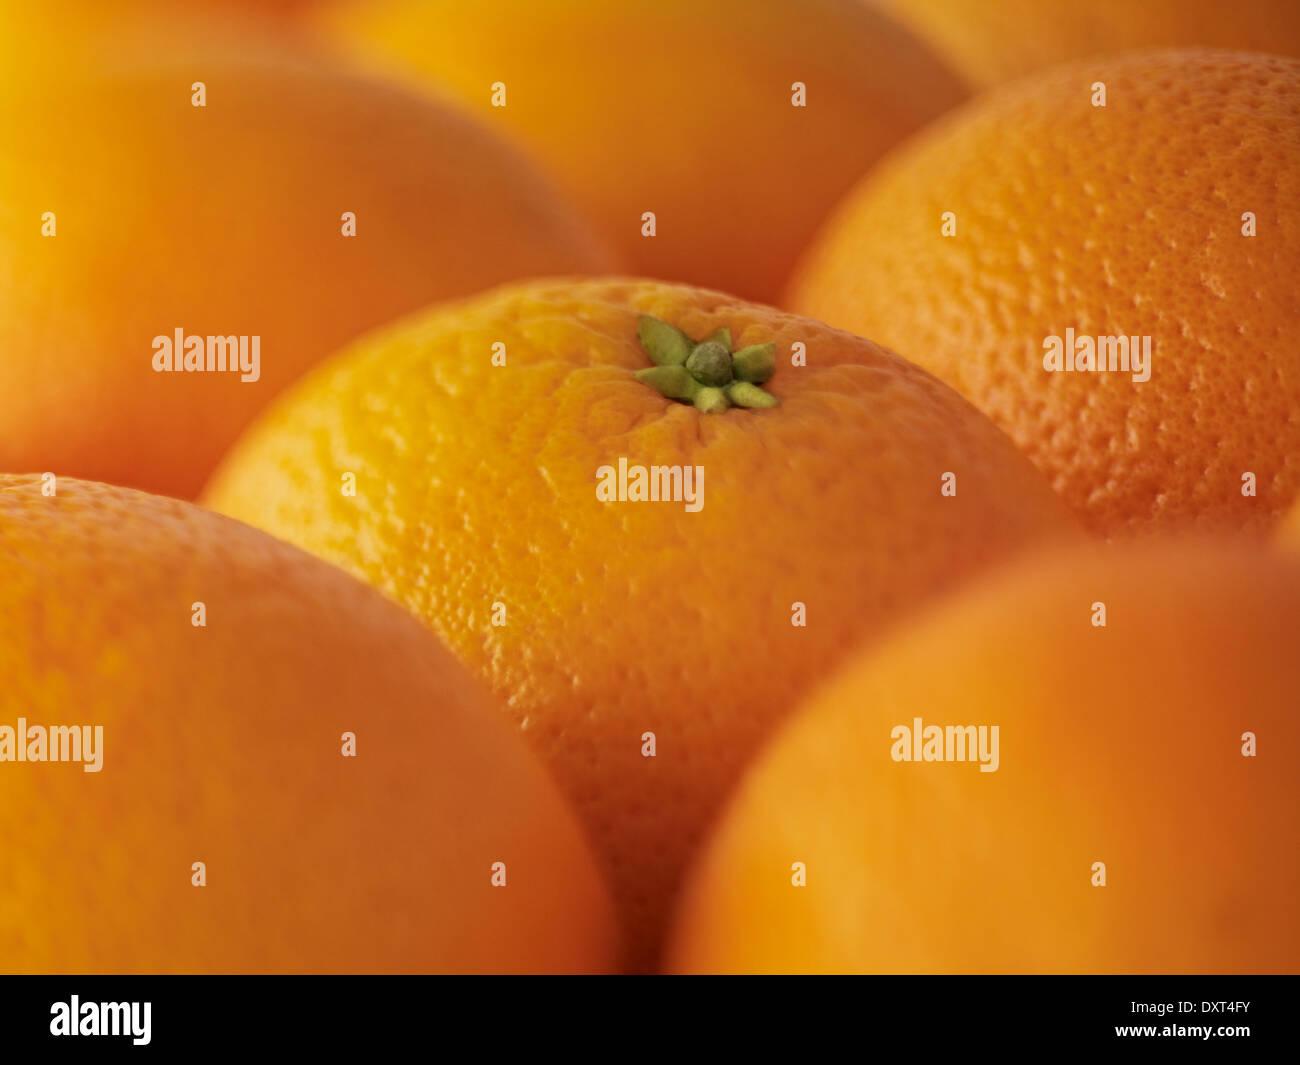 Extreme close up of oranges - Stock Image